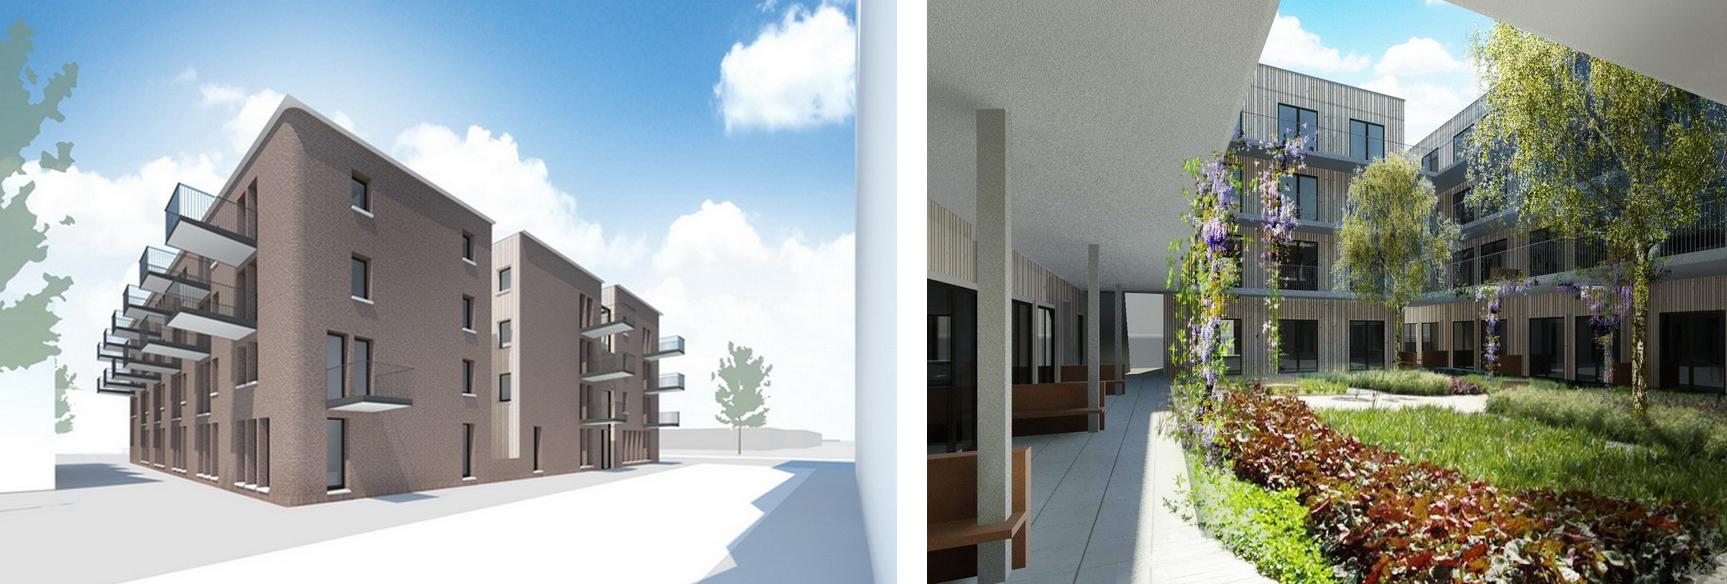 bouw sociale huur amsterdam